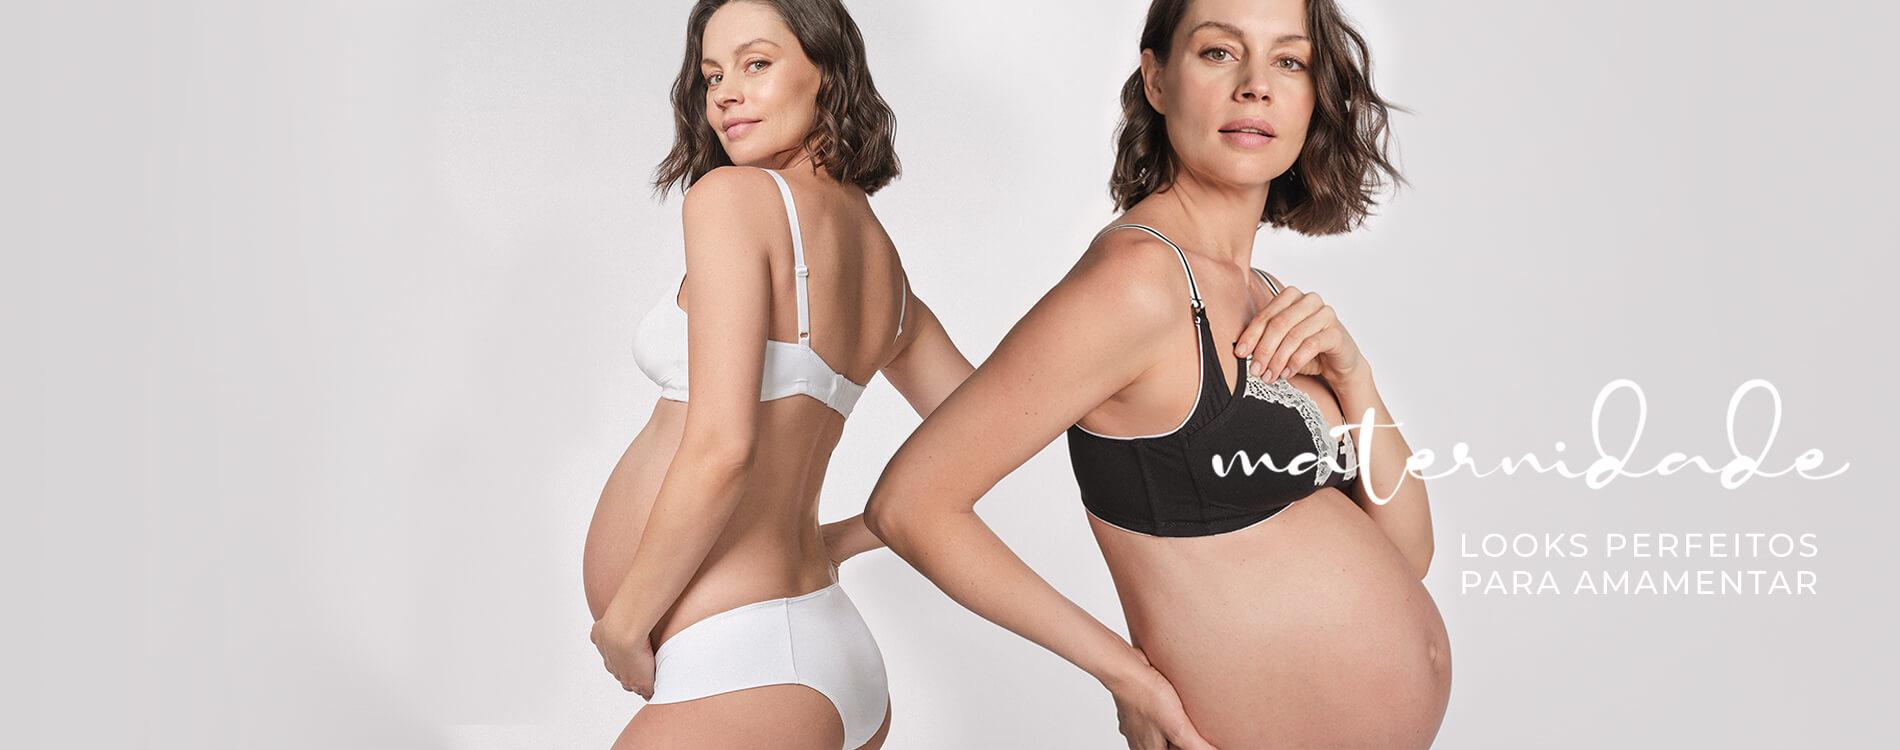 Maternidade looks - trackEcommerce